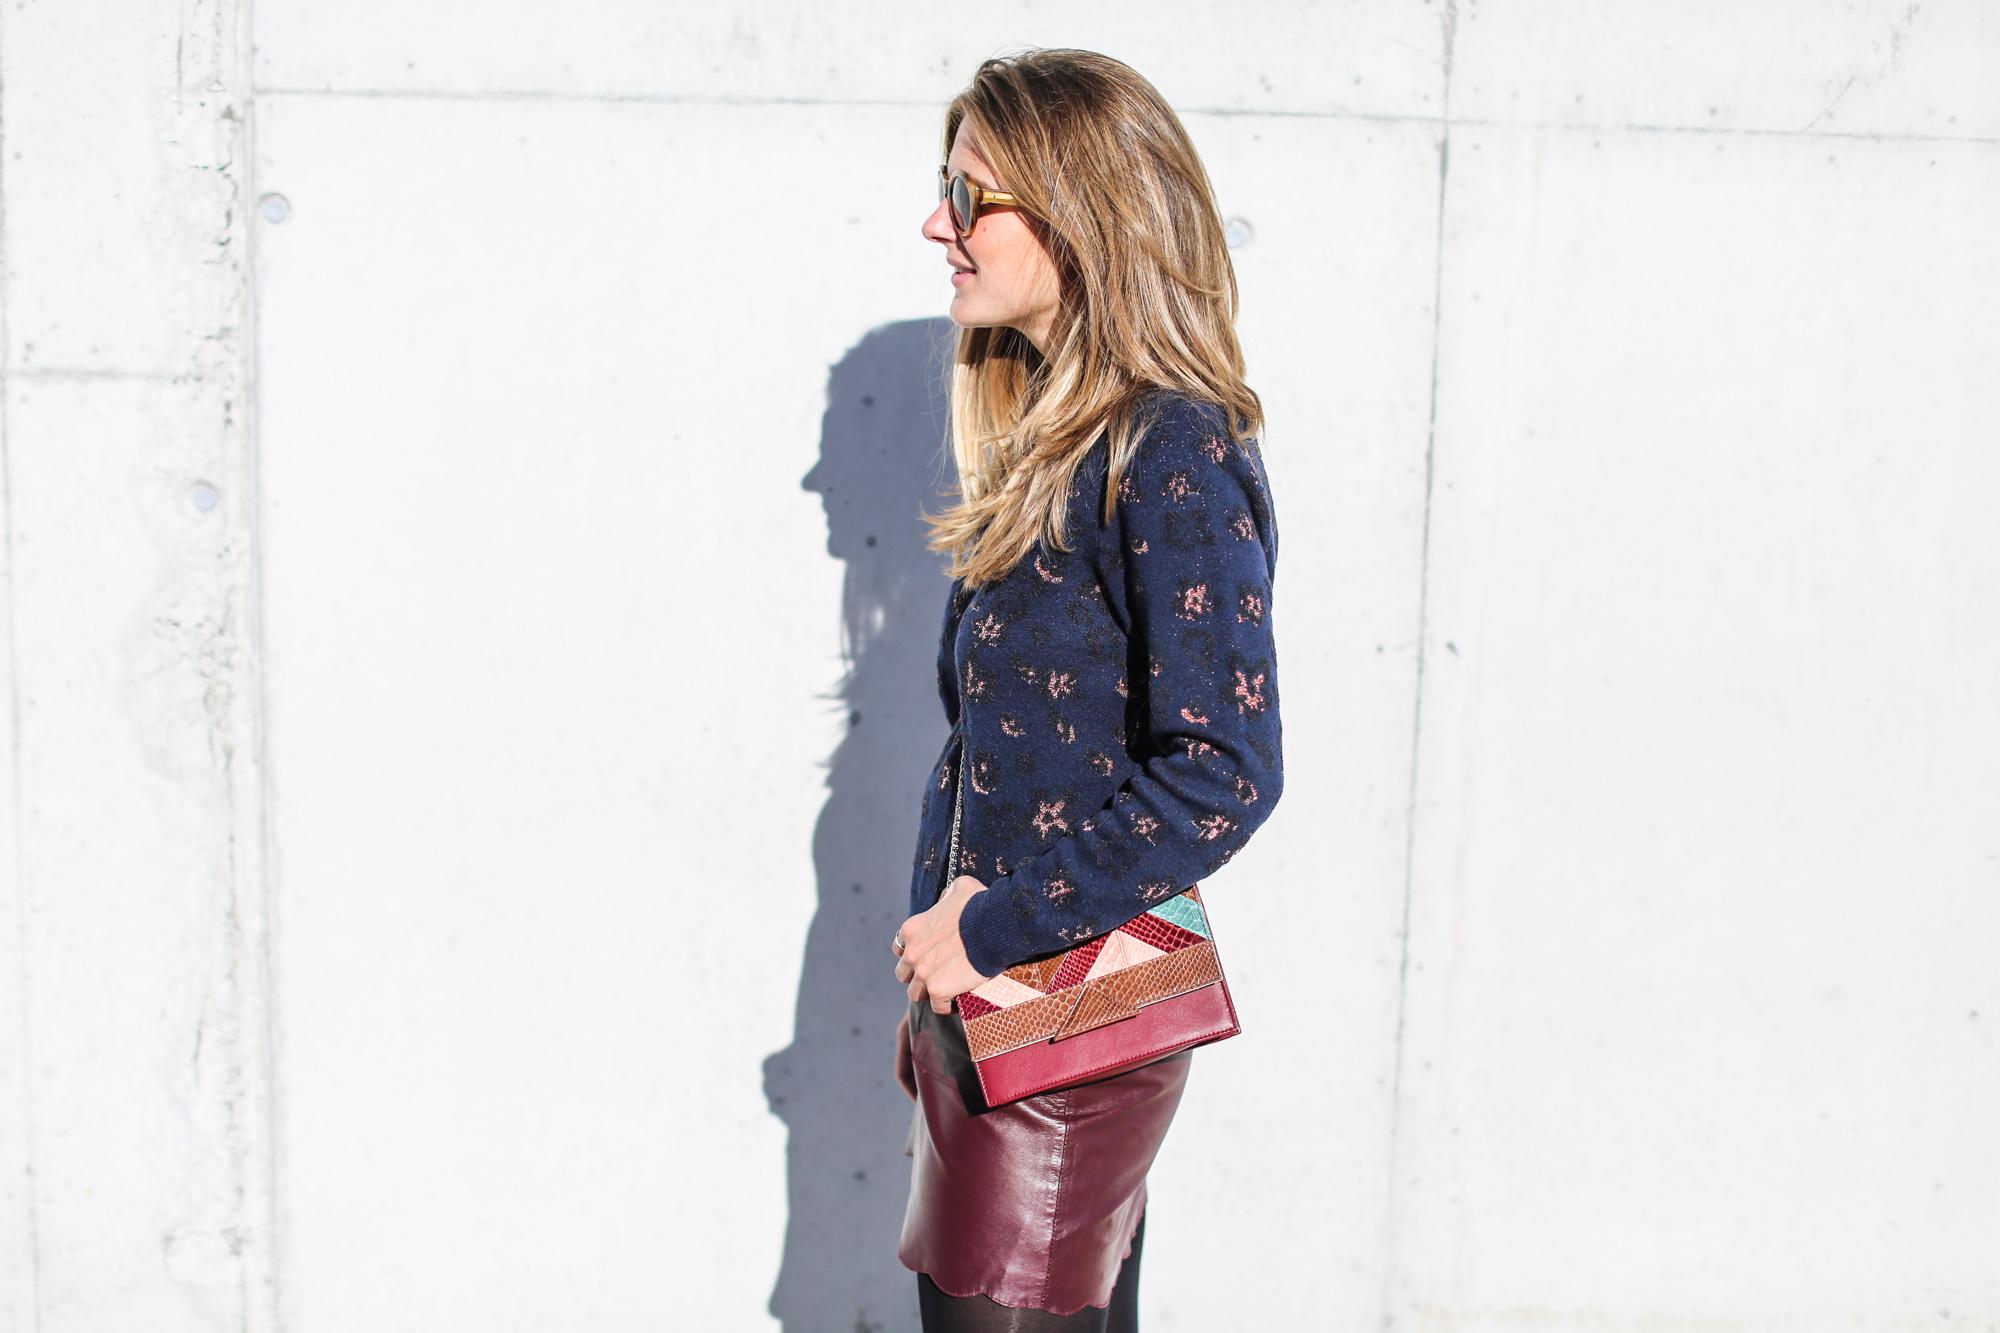 Clochet_fashionblogger_streetstyle_andotherstories_metallicflowersknit_heroscarf_leatherminiskirt-11